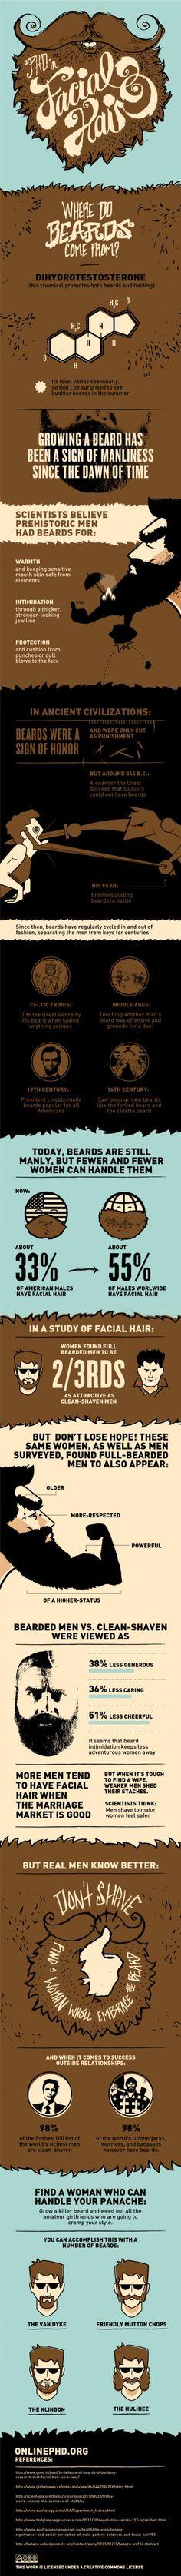 Beards, beards, beards. For my hubby who loves his beard...